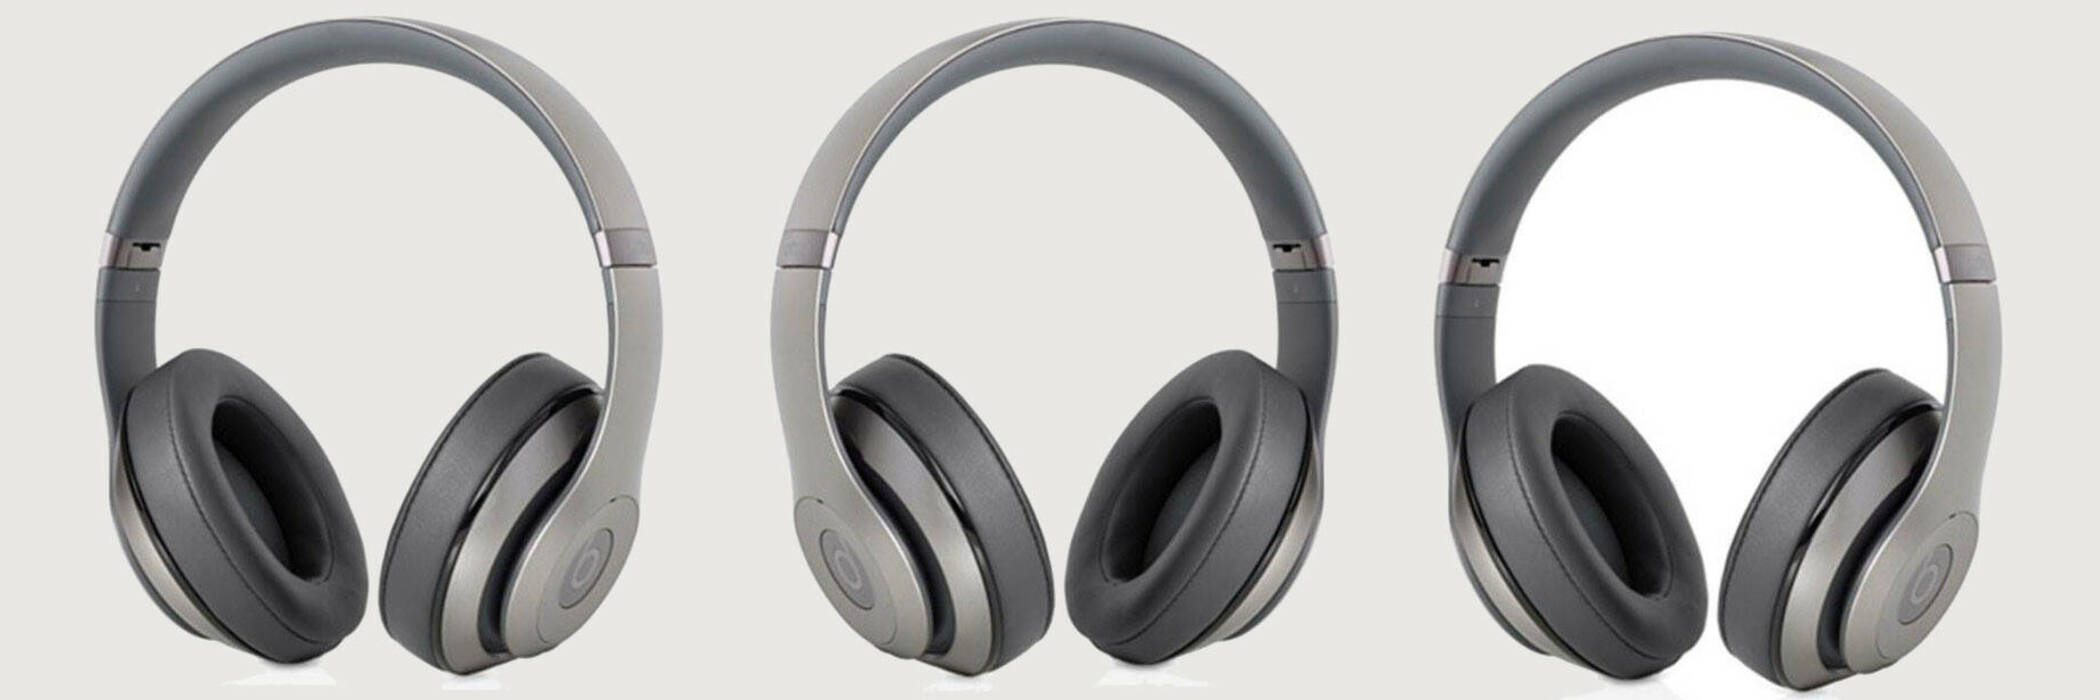 15jul beats studio wireless hero2a